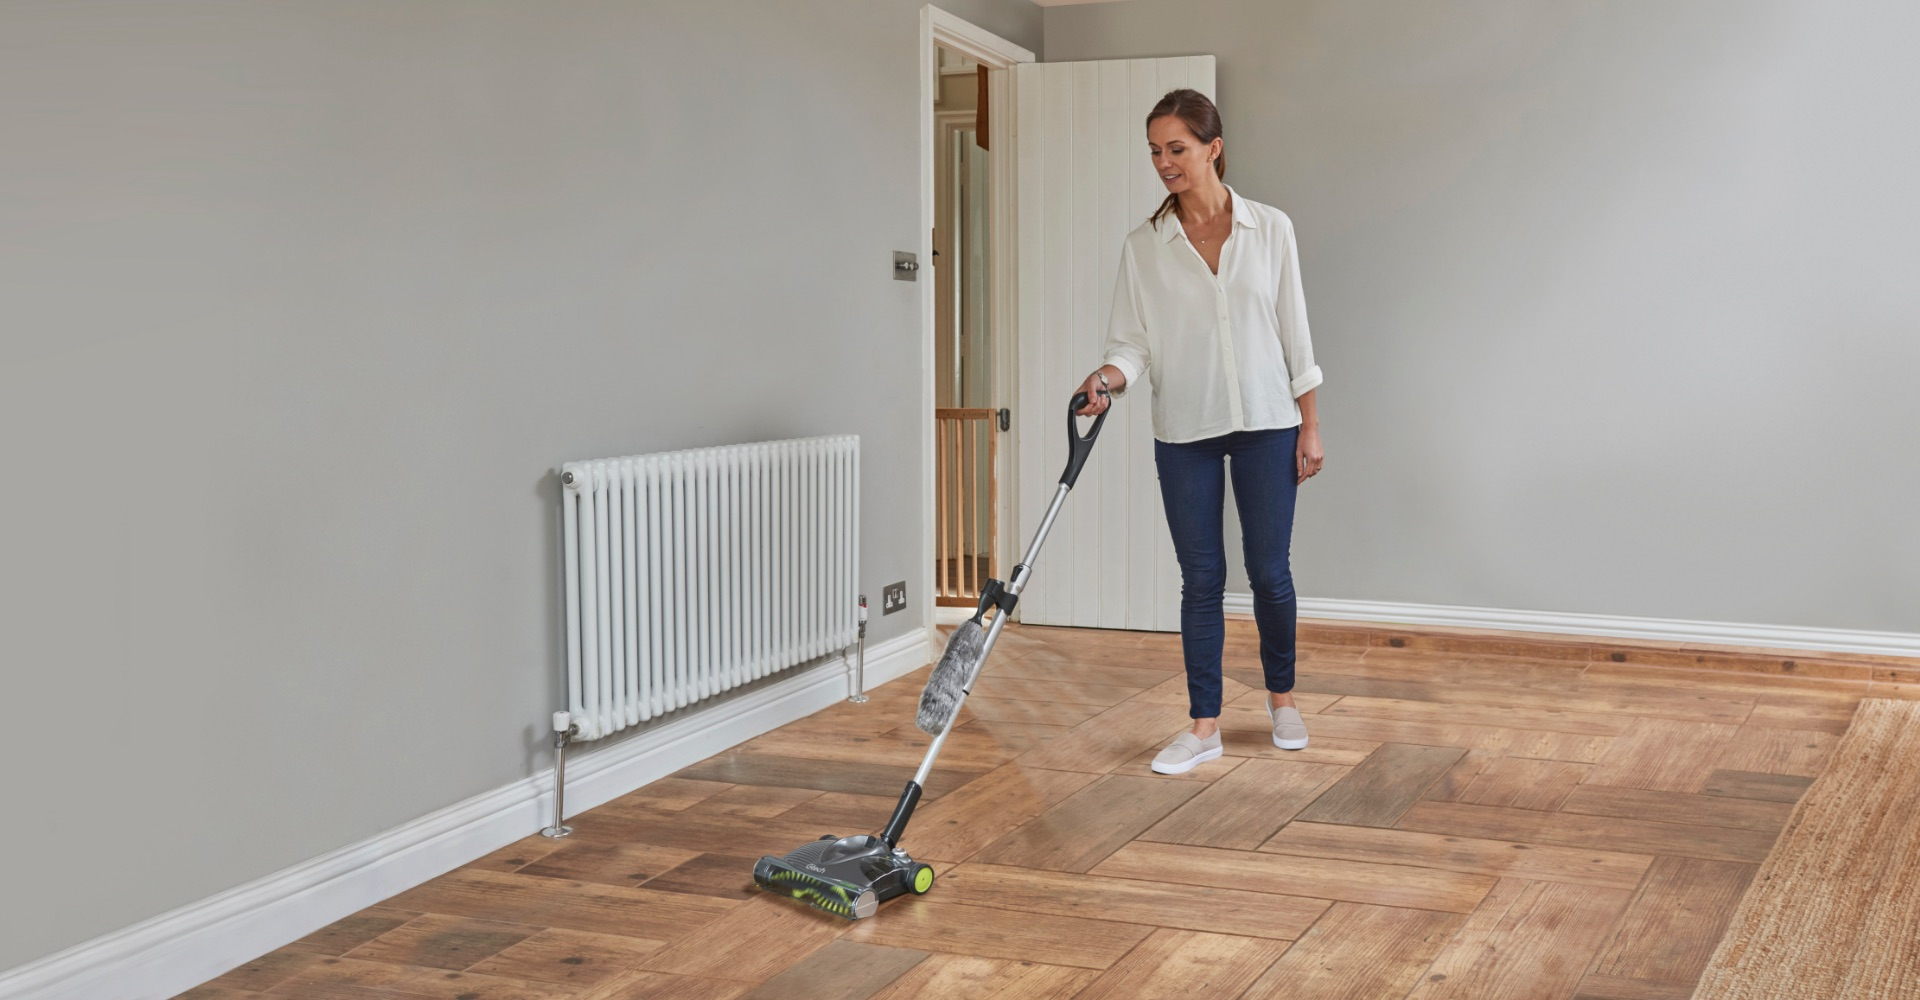 SW22 lithium carpet sweeper